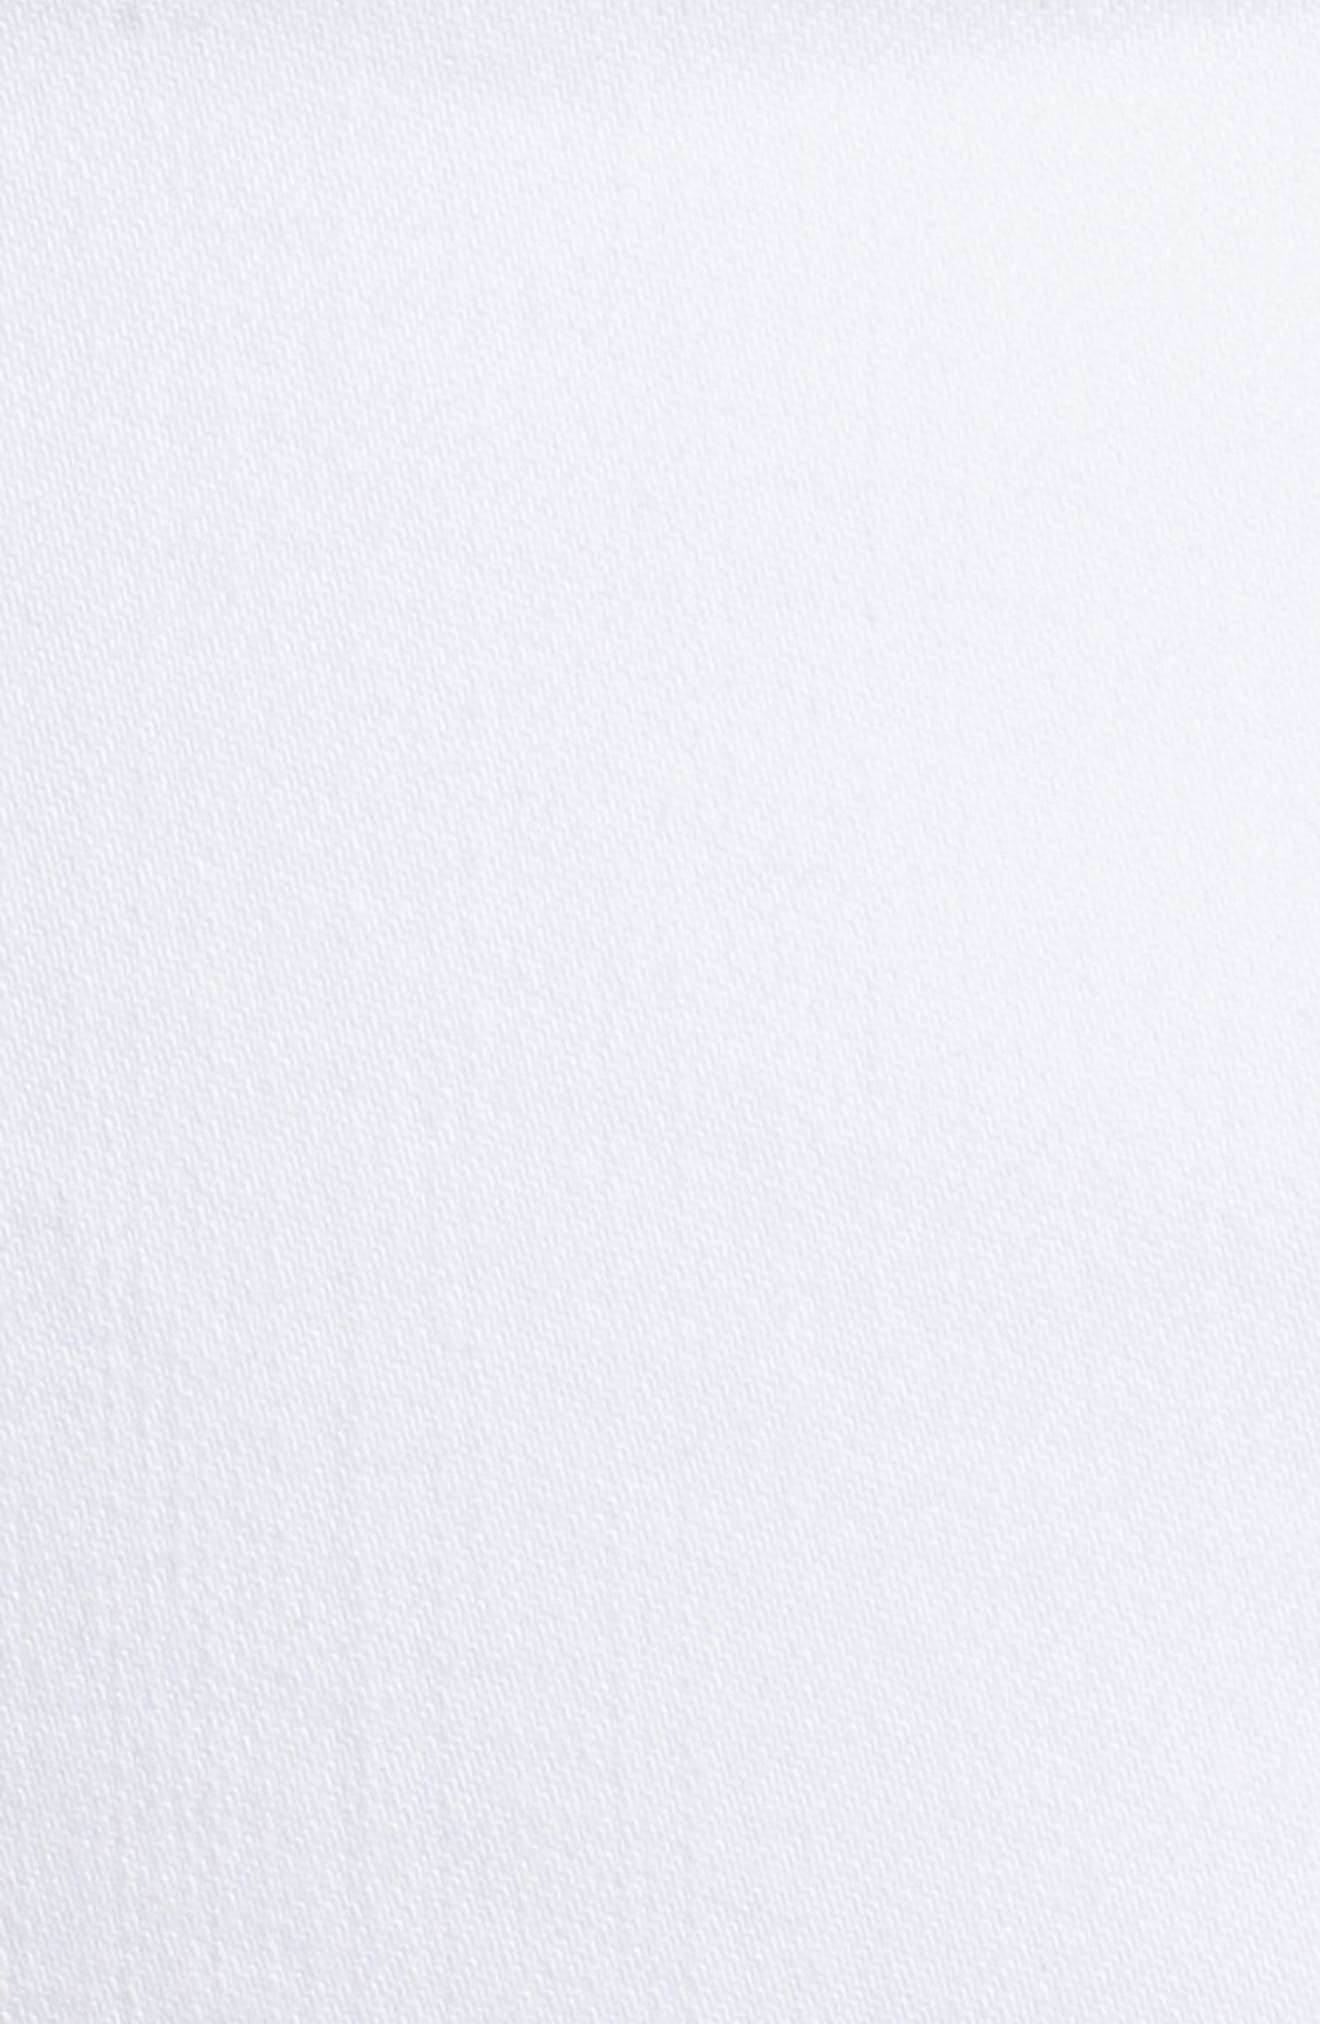 Ab-Solution White Denim Shorts,                             Alternate thumbnail 5, color,                             Optic White